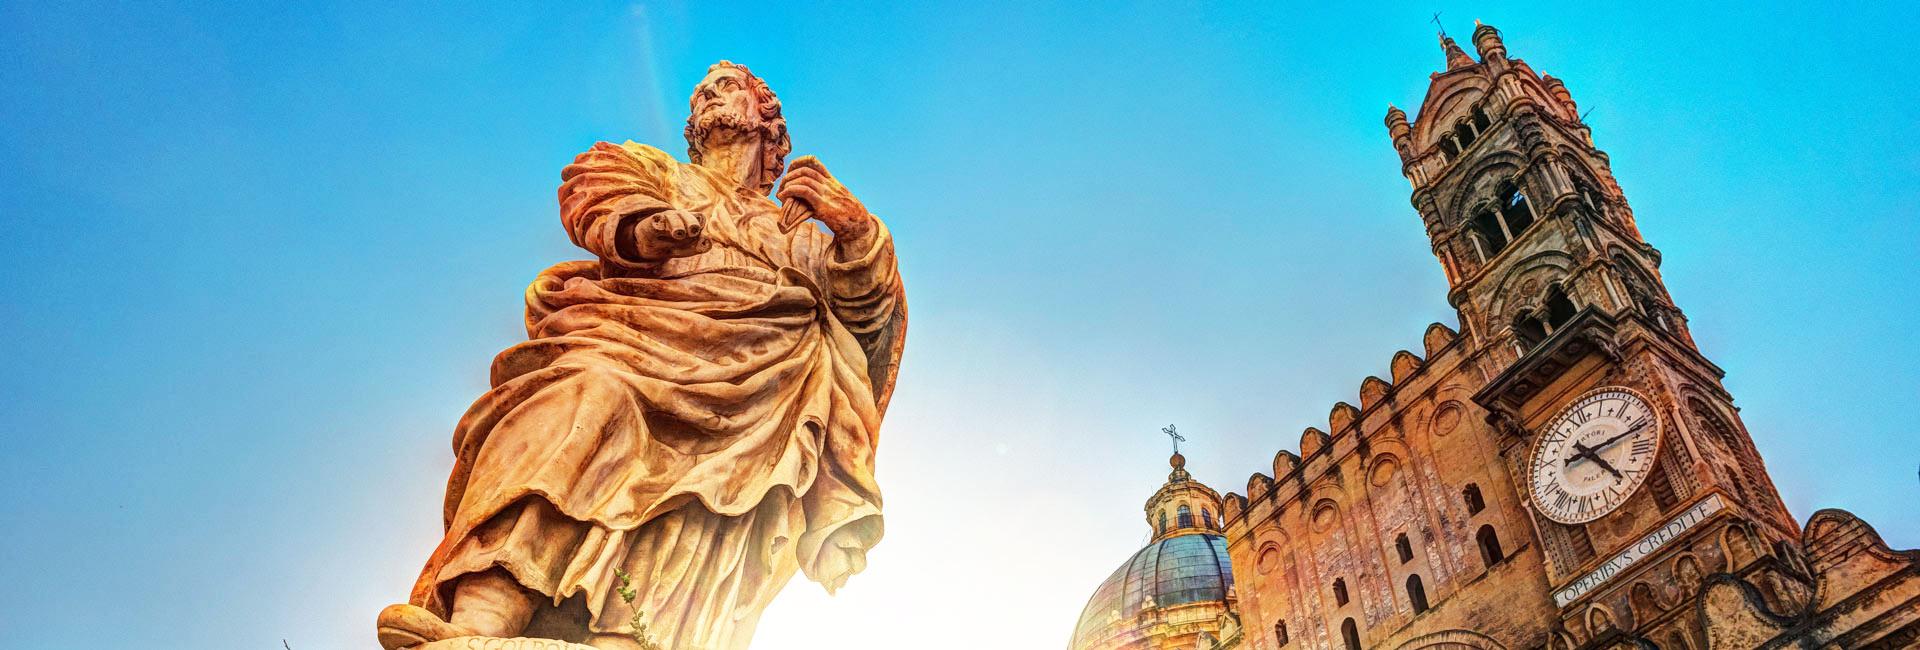 C-_Users_User_Desktop_Slider_Statua_Cattedrale-di-Palermo_AdobeStock_128697203